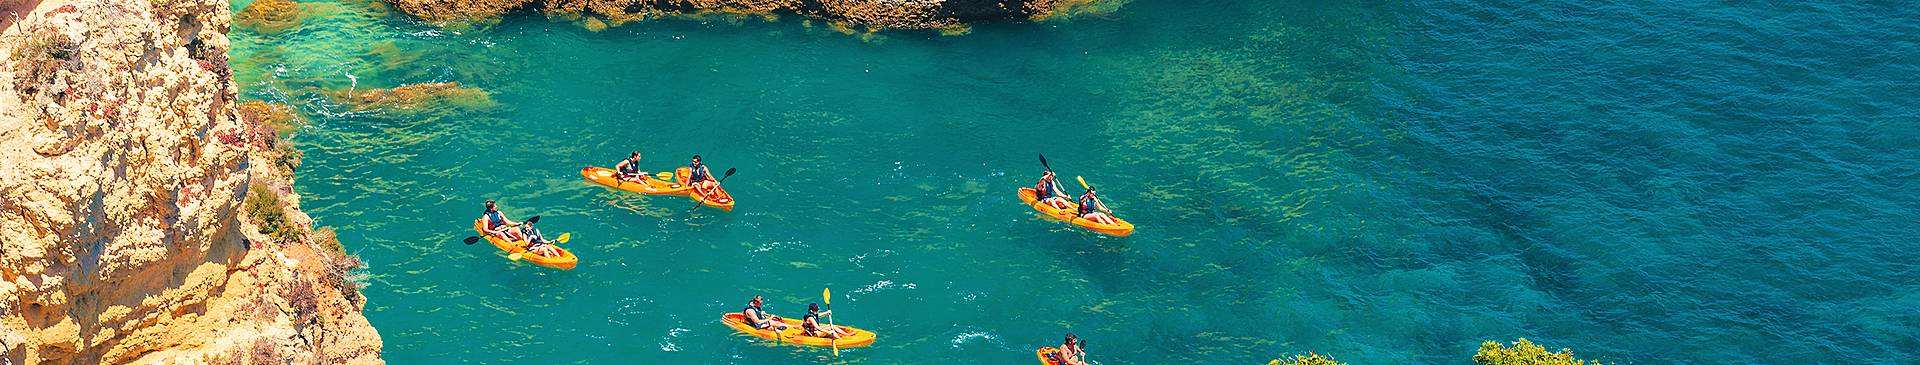 Portugal adventure holidays